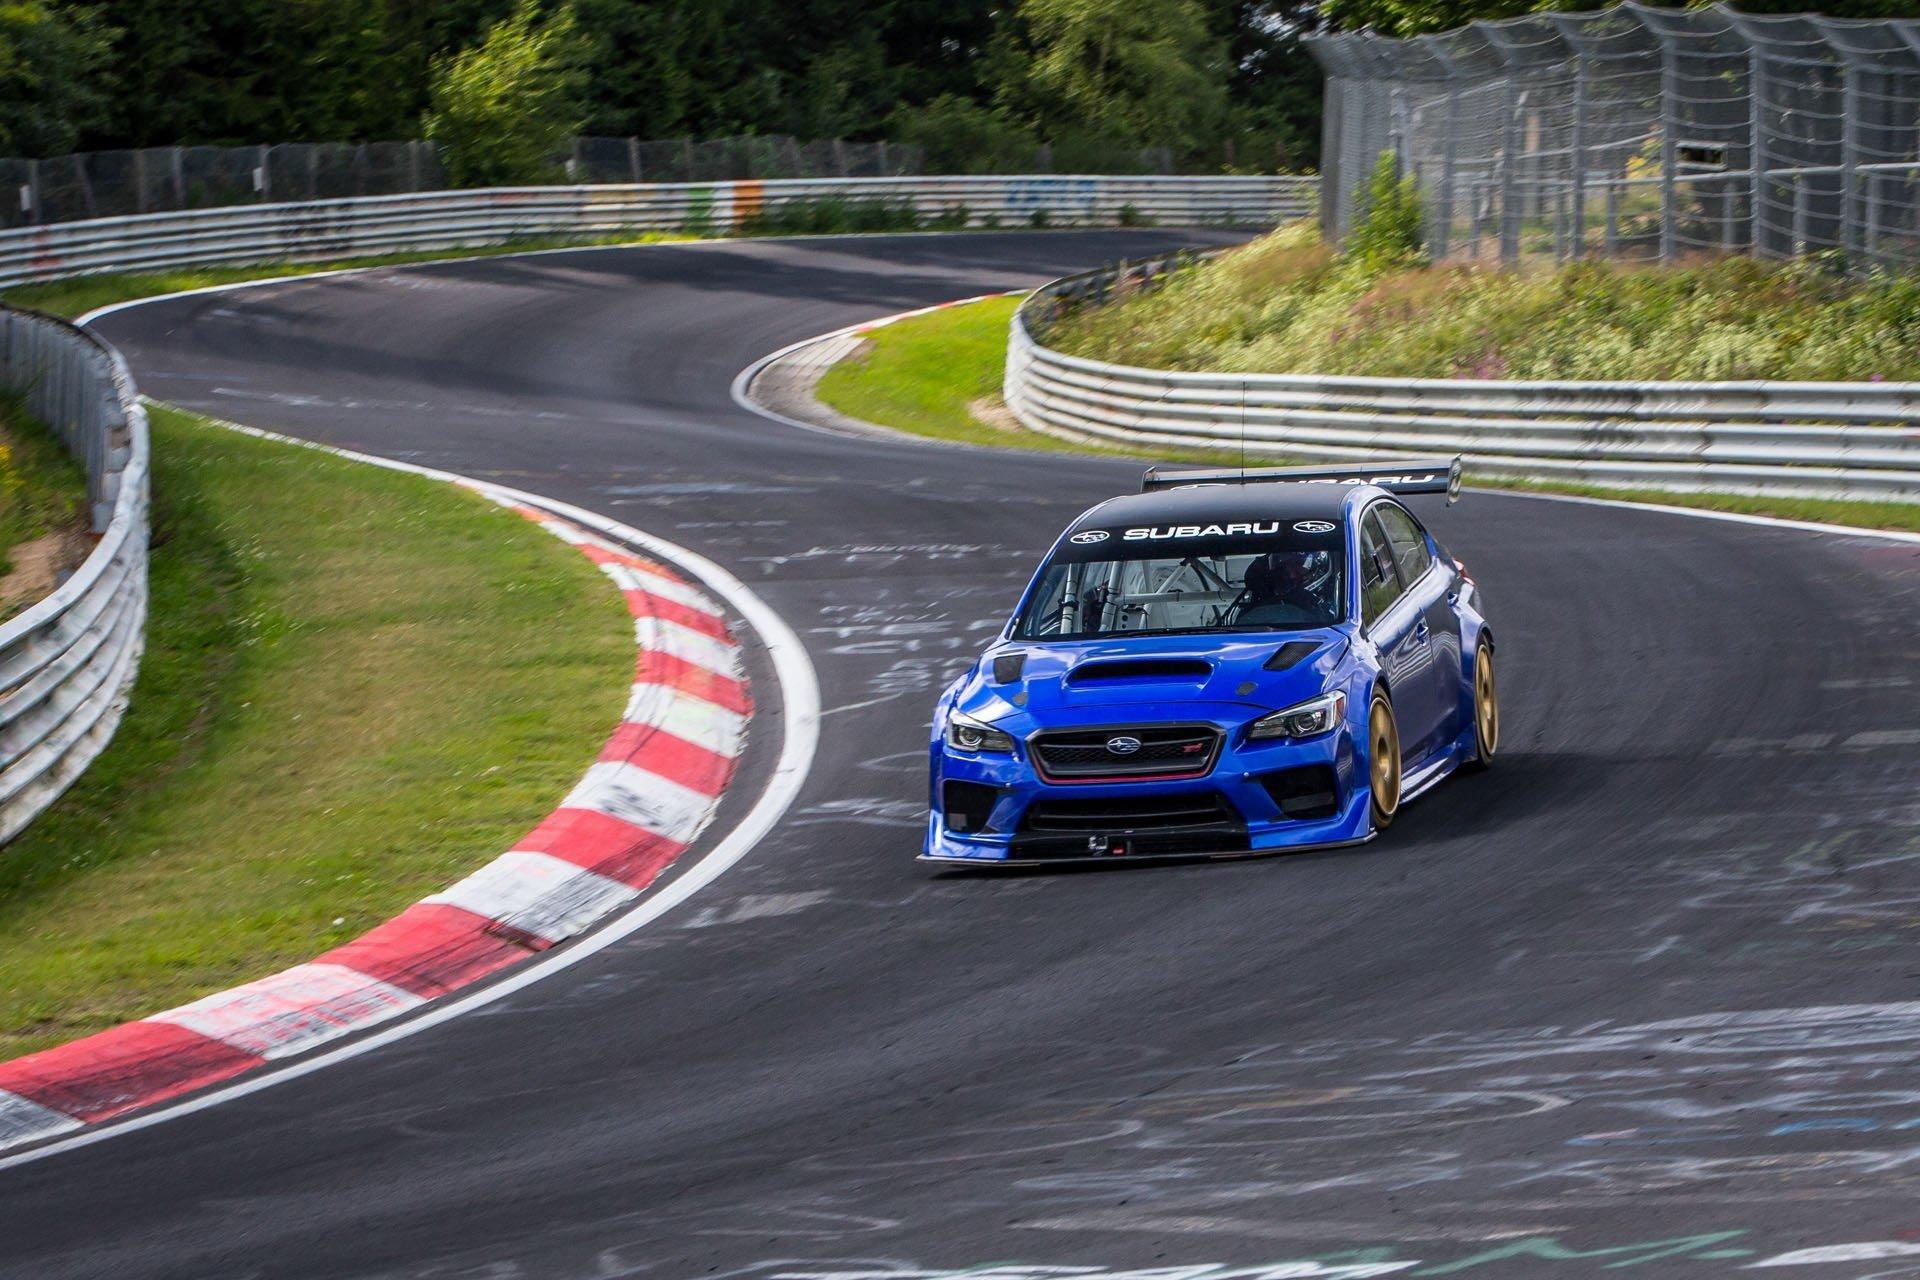 Subaru WRX STI at the Nürburgring